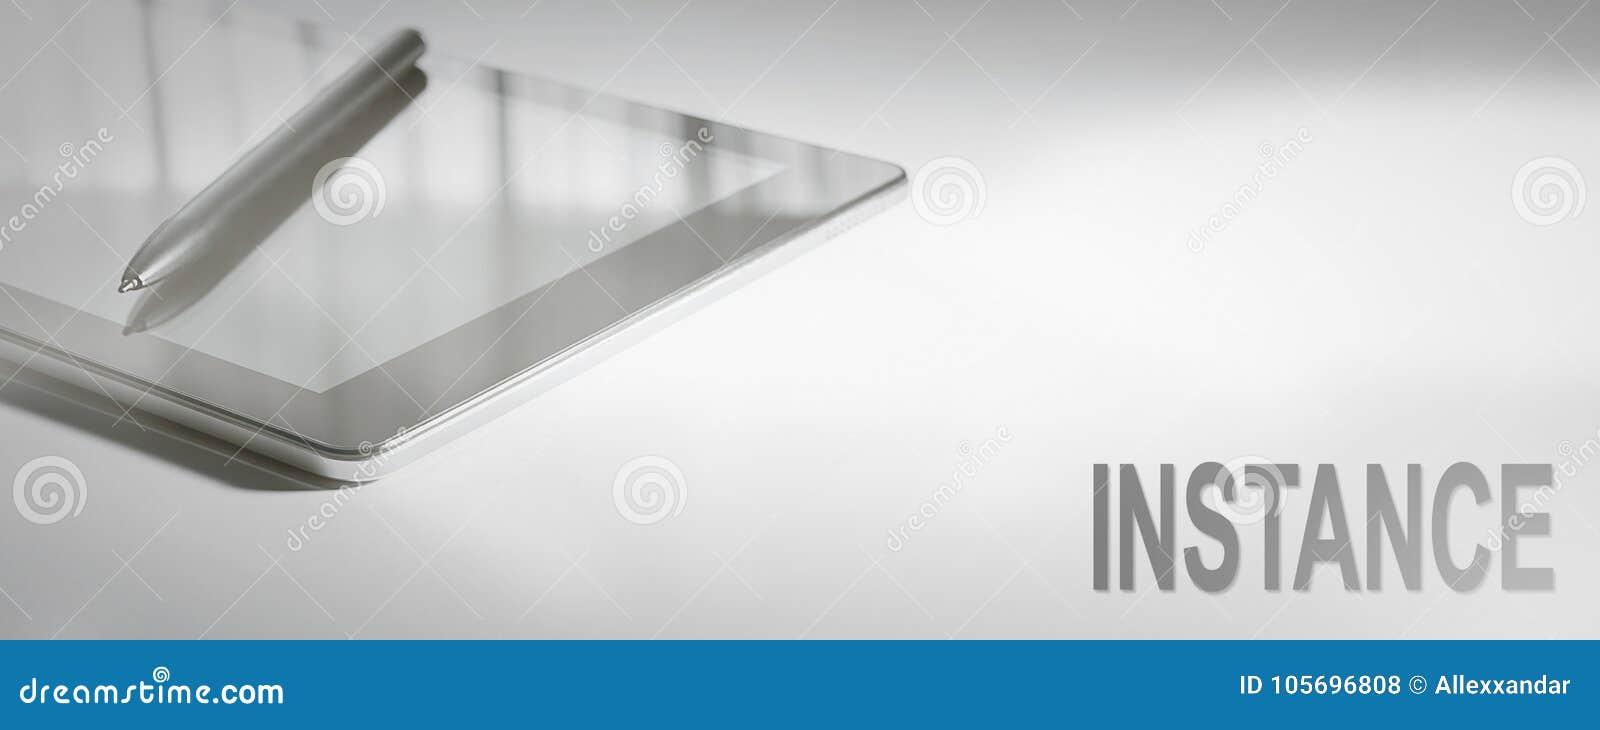 INSTANCE Business Concept Digital Technology.